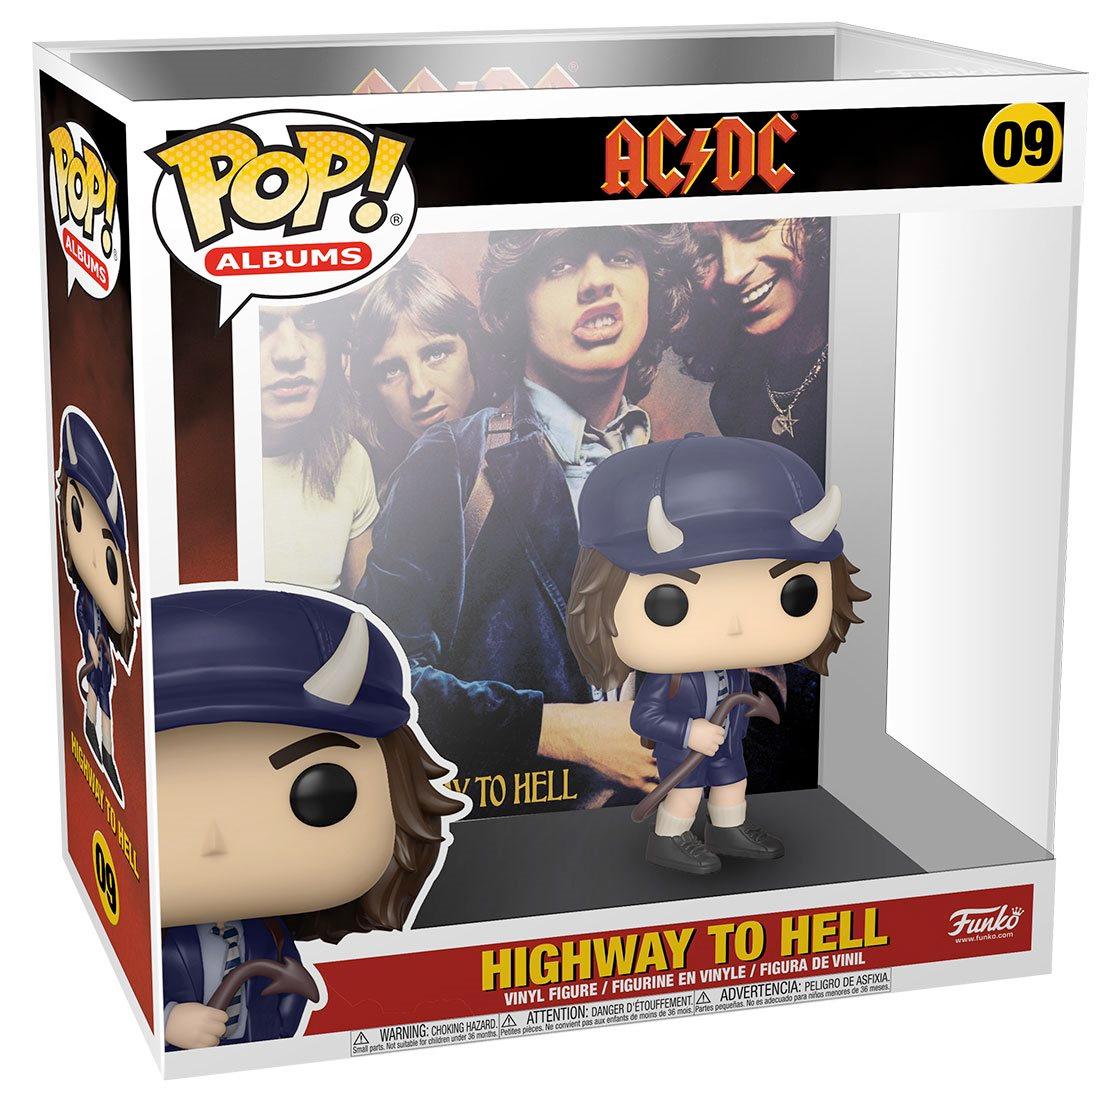 Boneco Pop! Albums AC/DC Highway to Hell